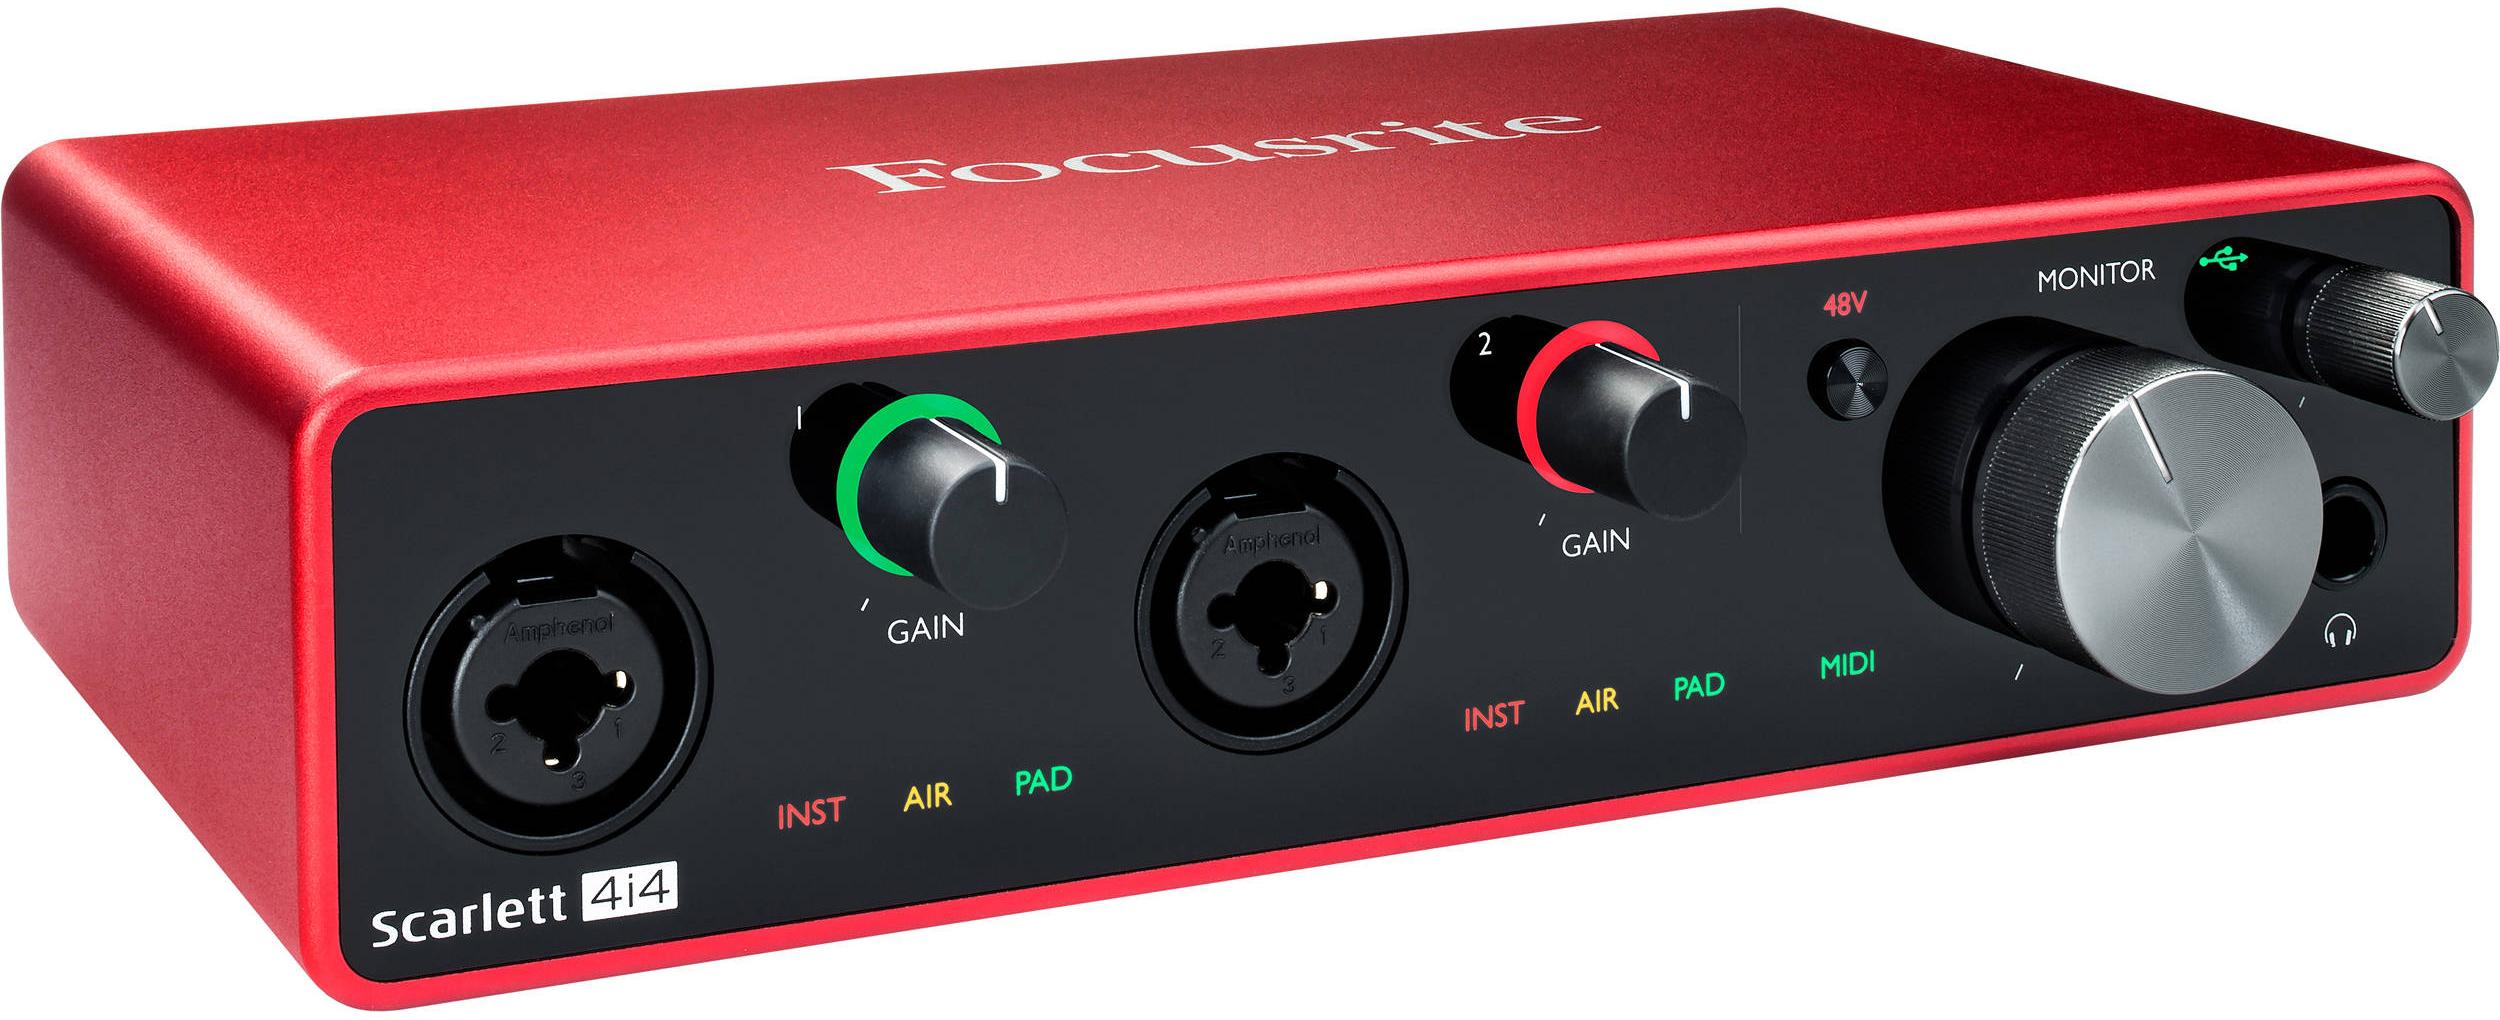 Focusrite Scarlett 4i4 4x4 USB Audio Interface